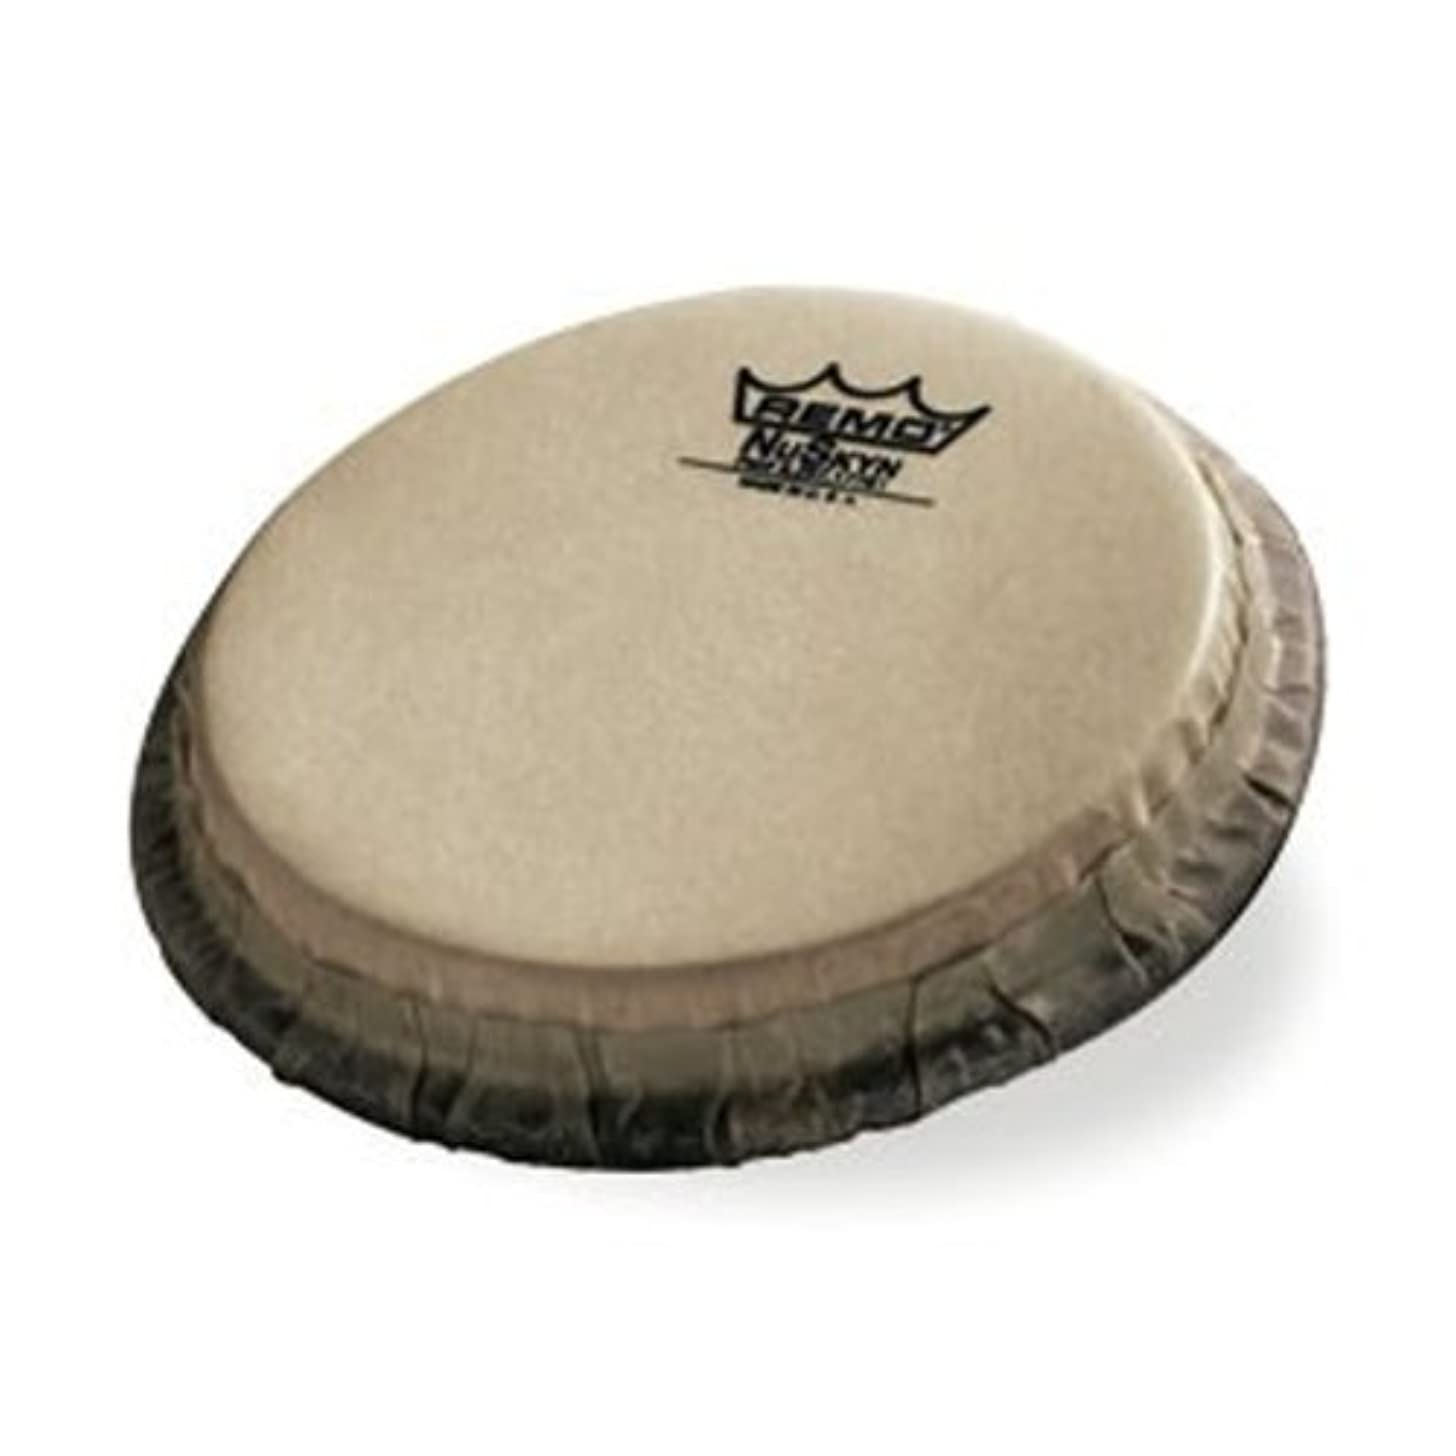 REMO Bongo Drumhead, Tucked, 9